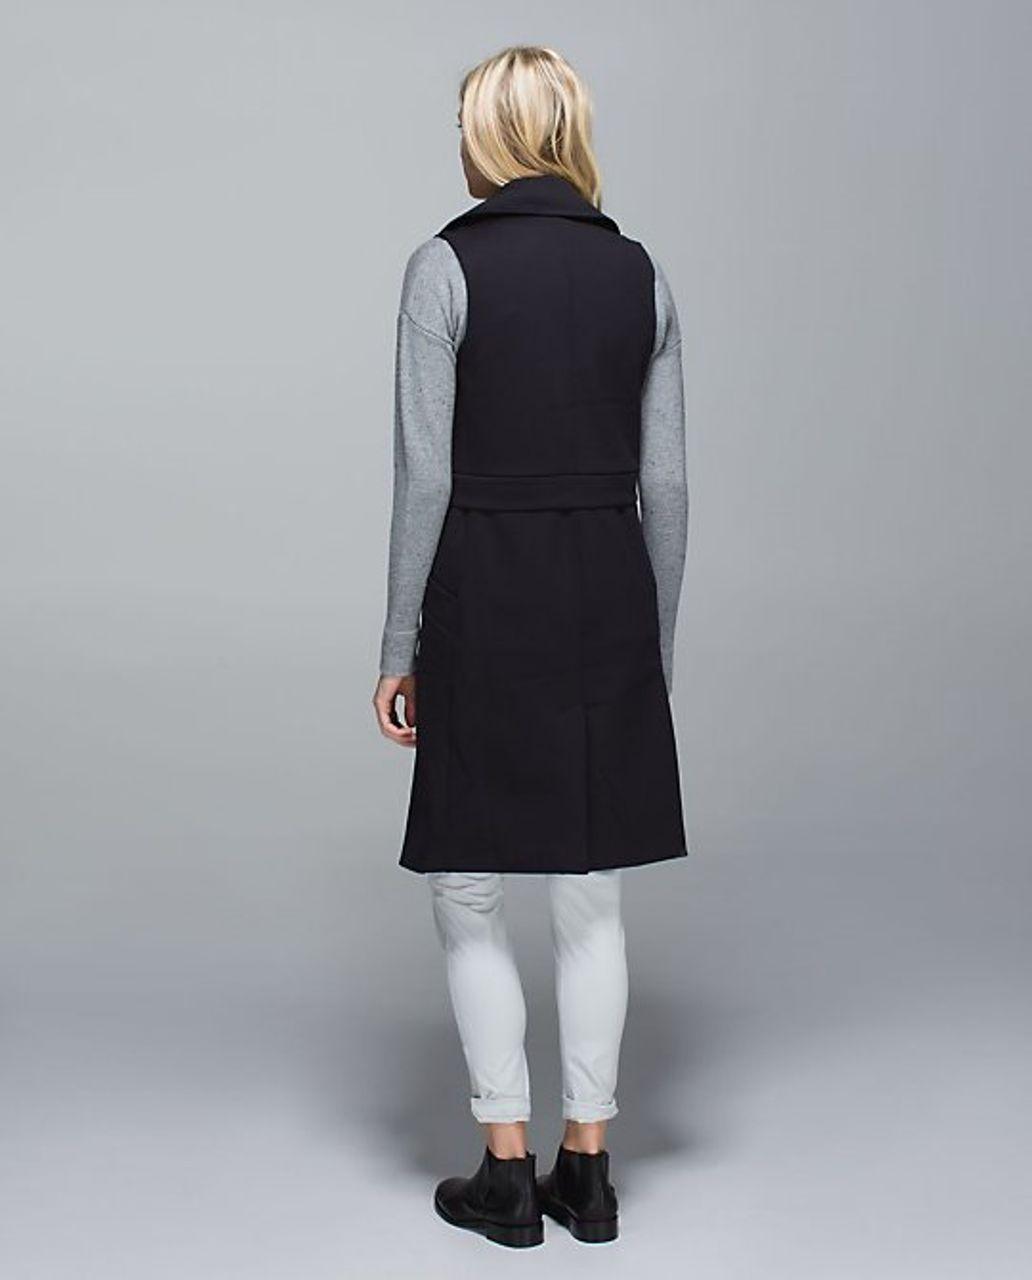 Lululemon Quick Change Vest - Black